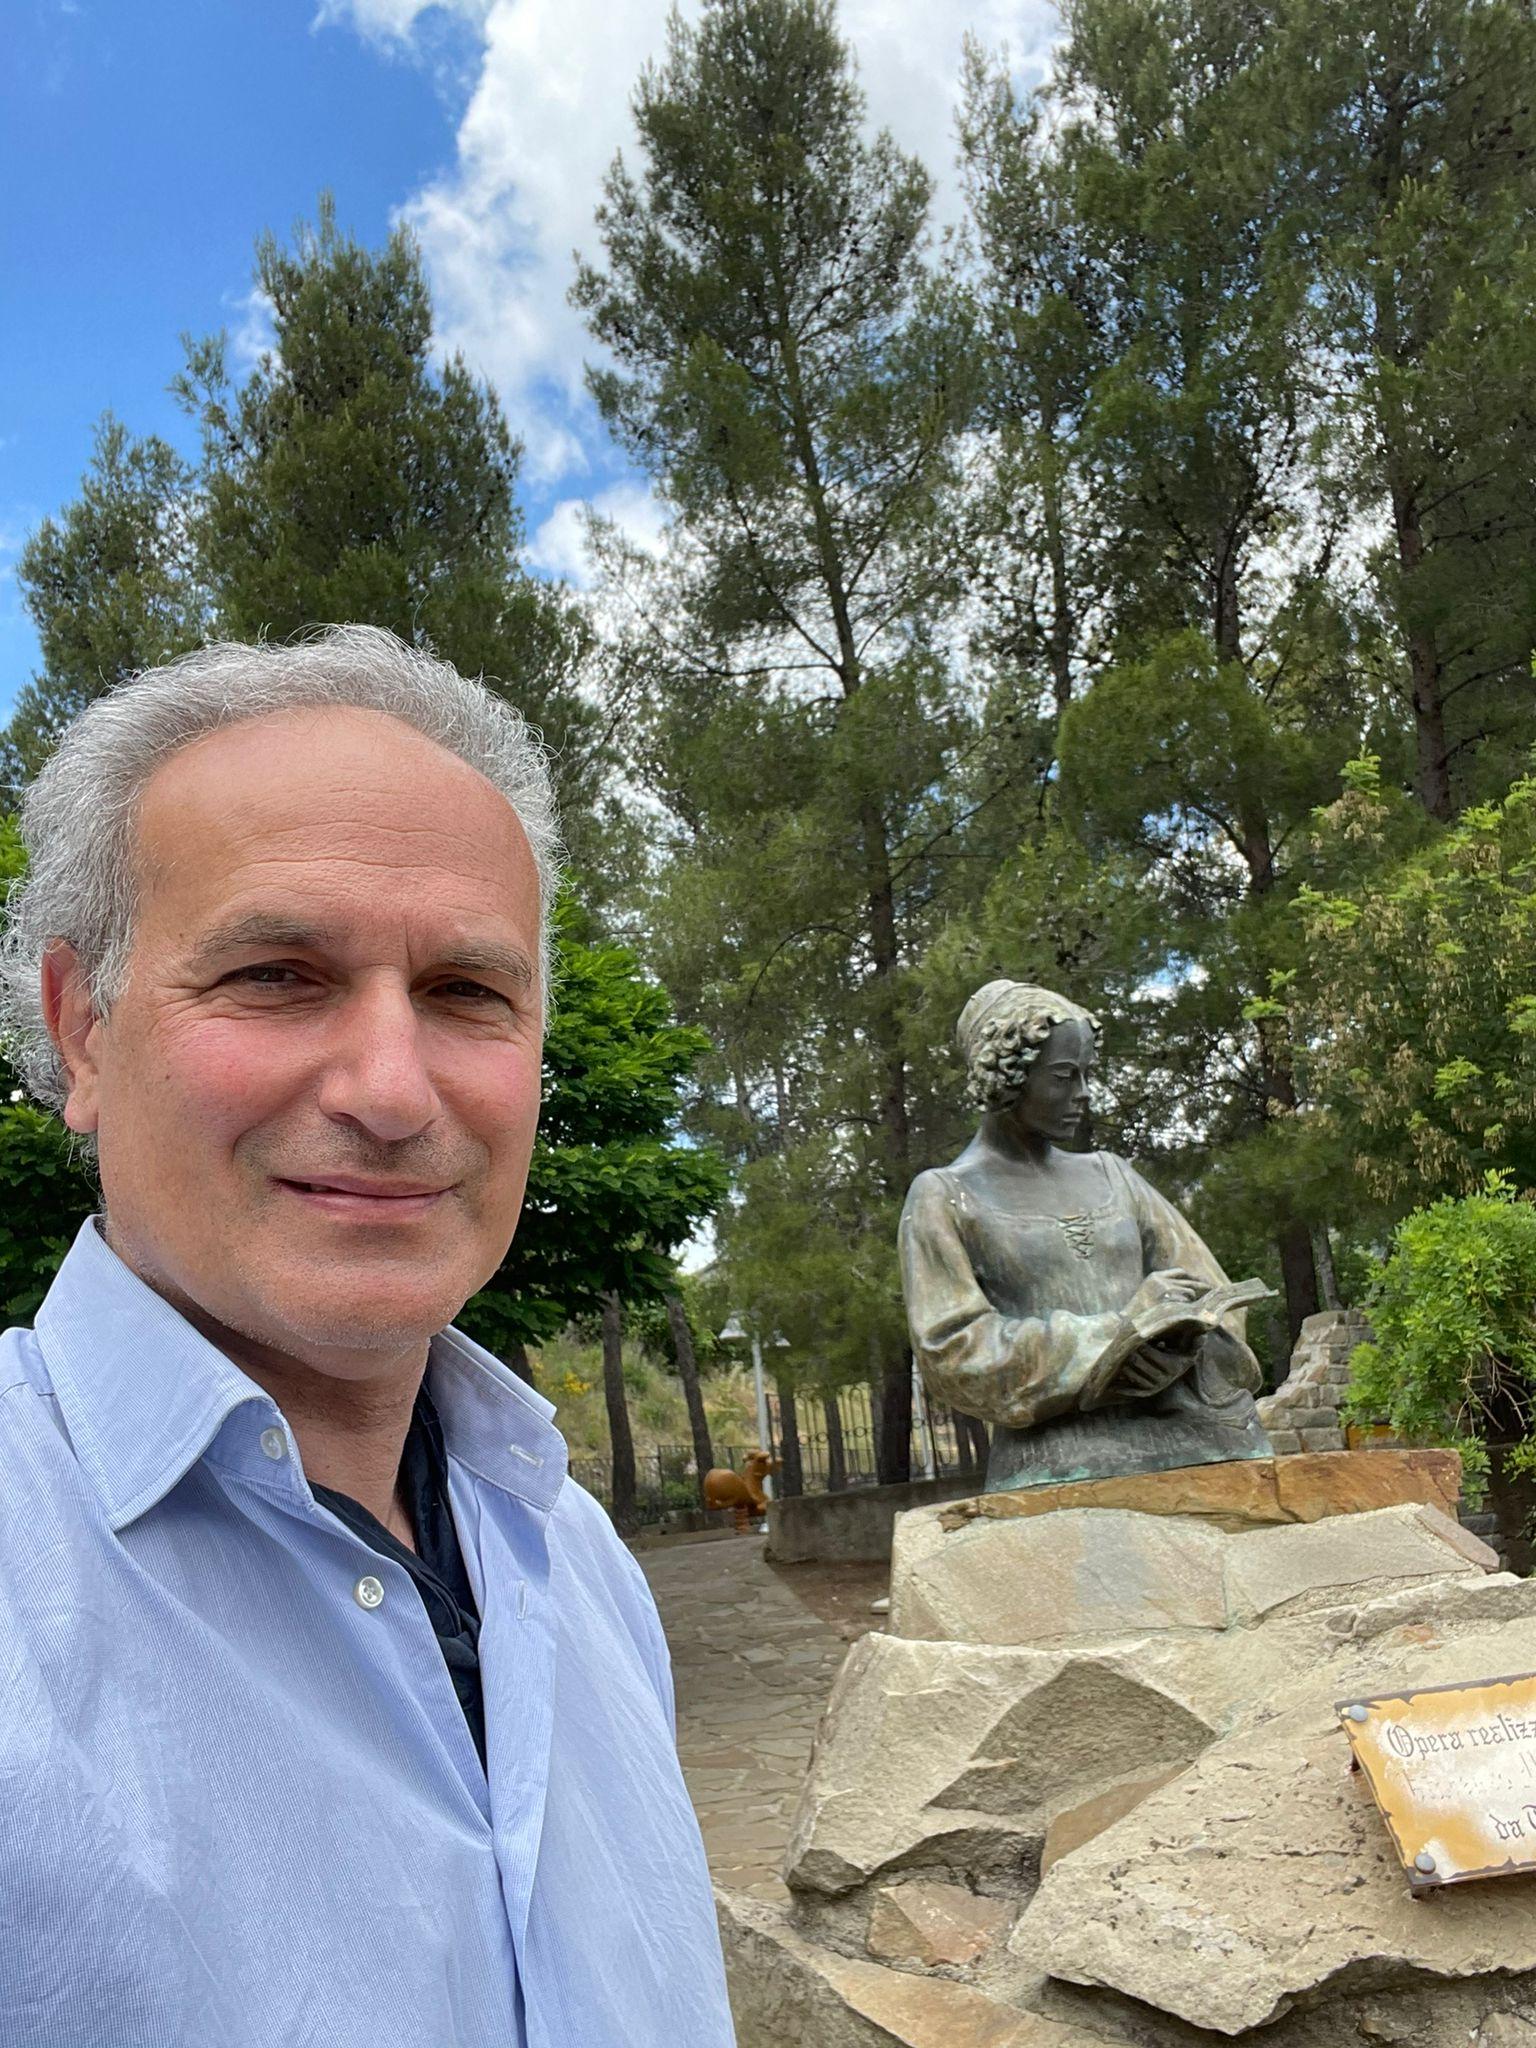 Giuseppe Siniscalchi a Valsinni zona scultura dedicata ad Isabella Morra